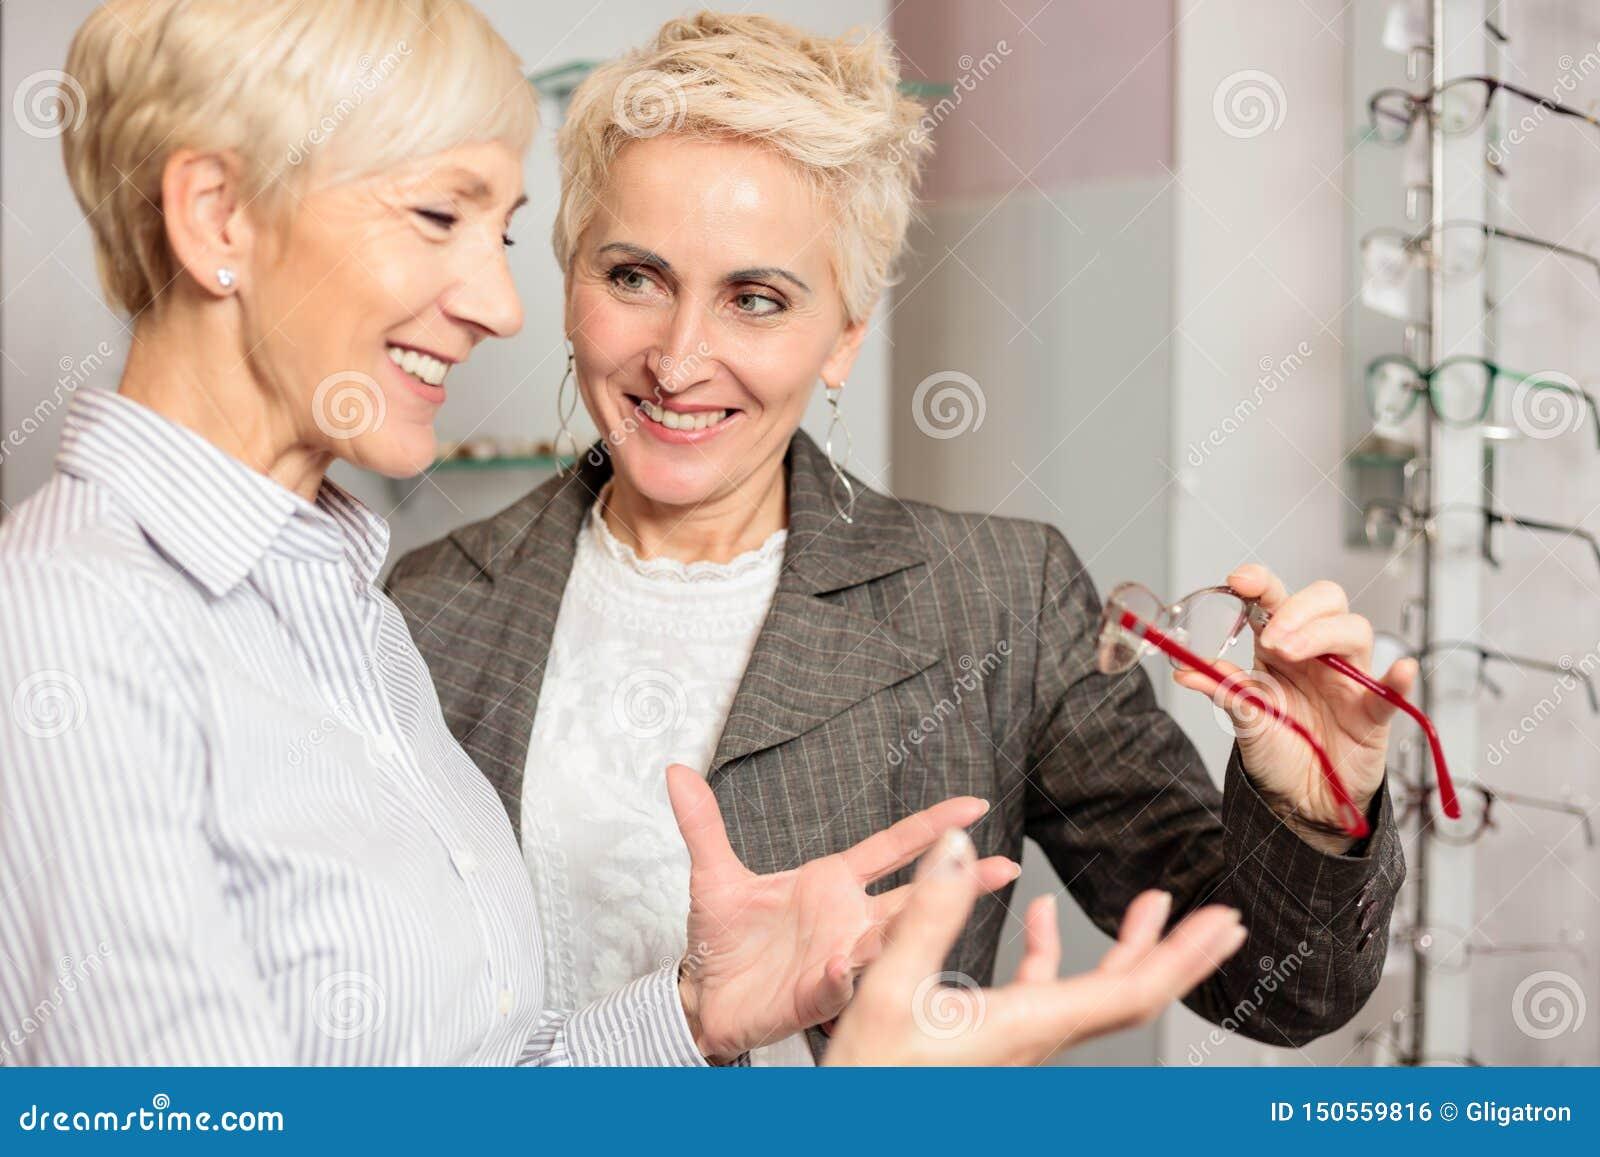 Two mature women shopping and choosing prescription eyeglasses